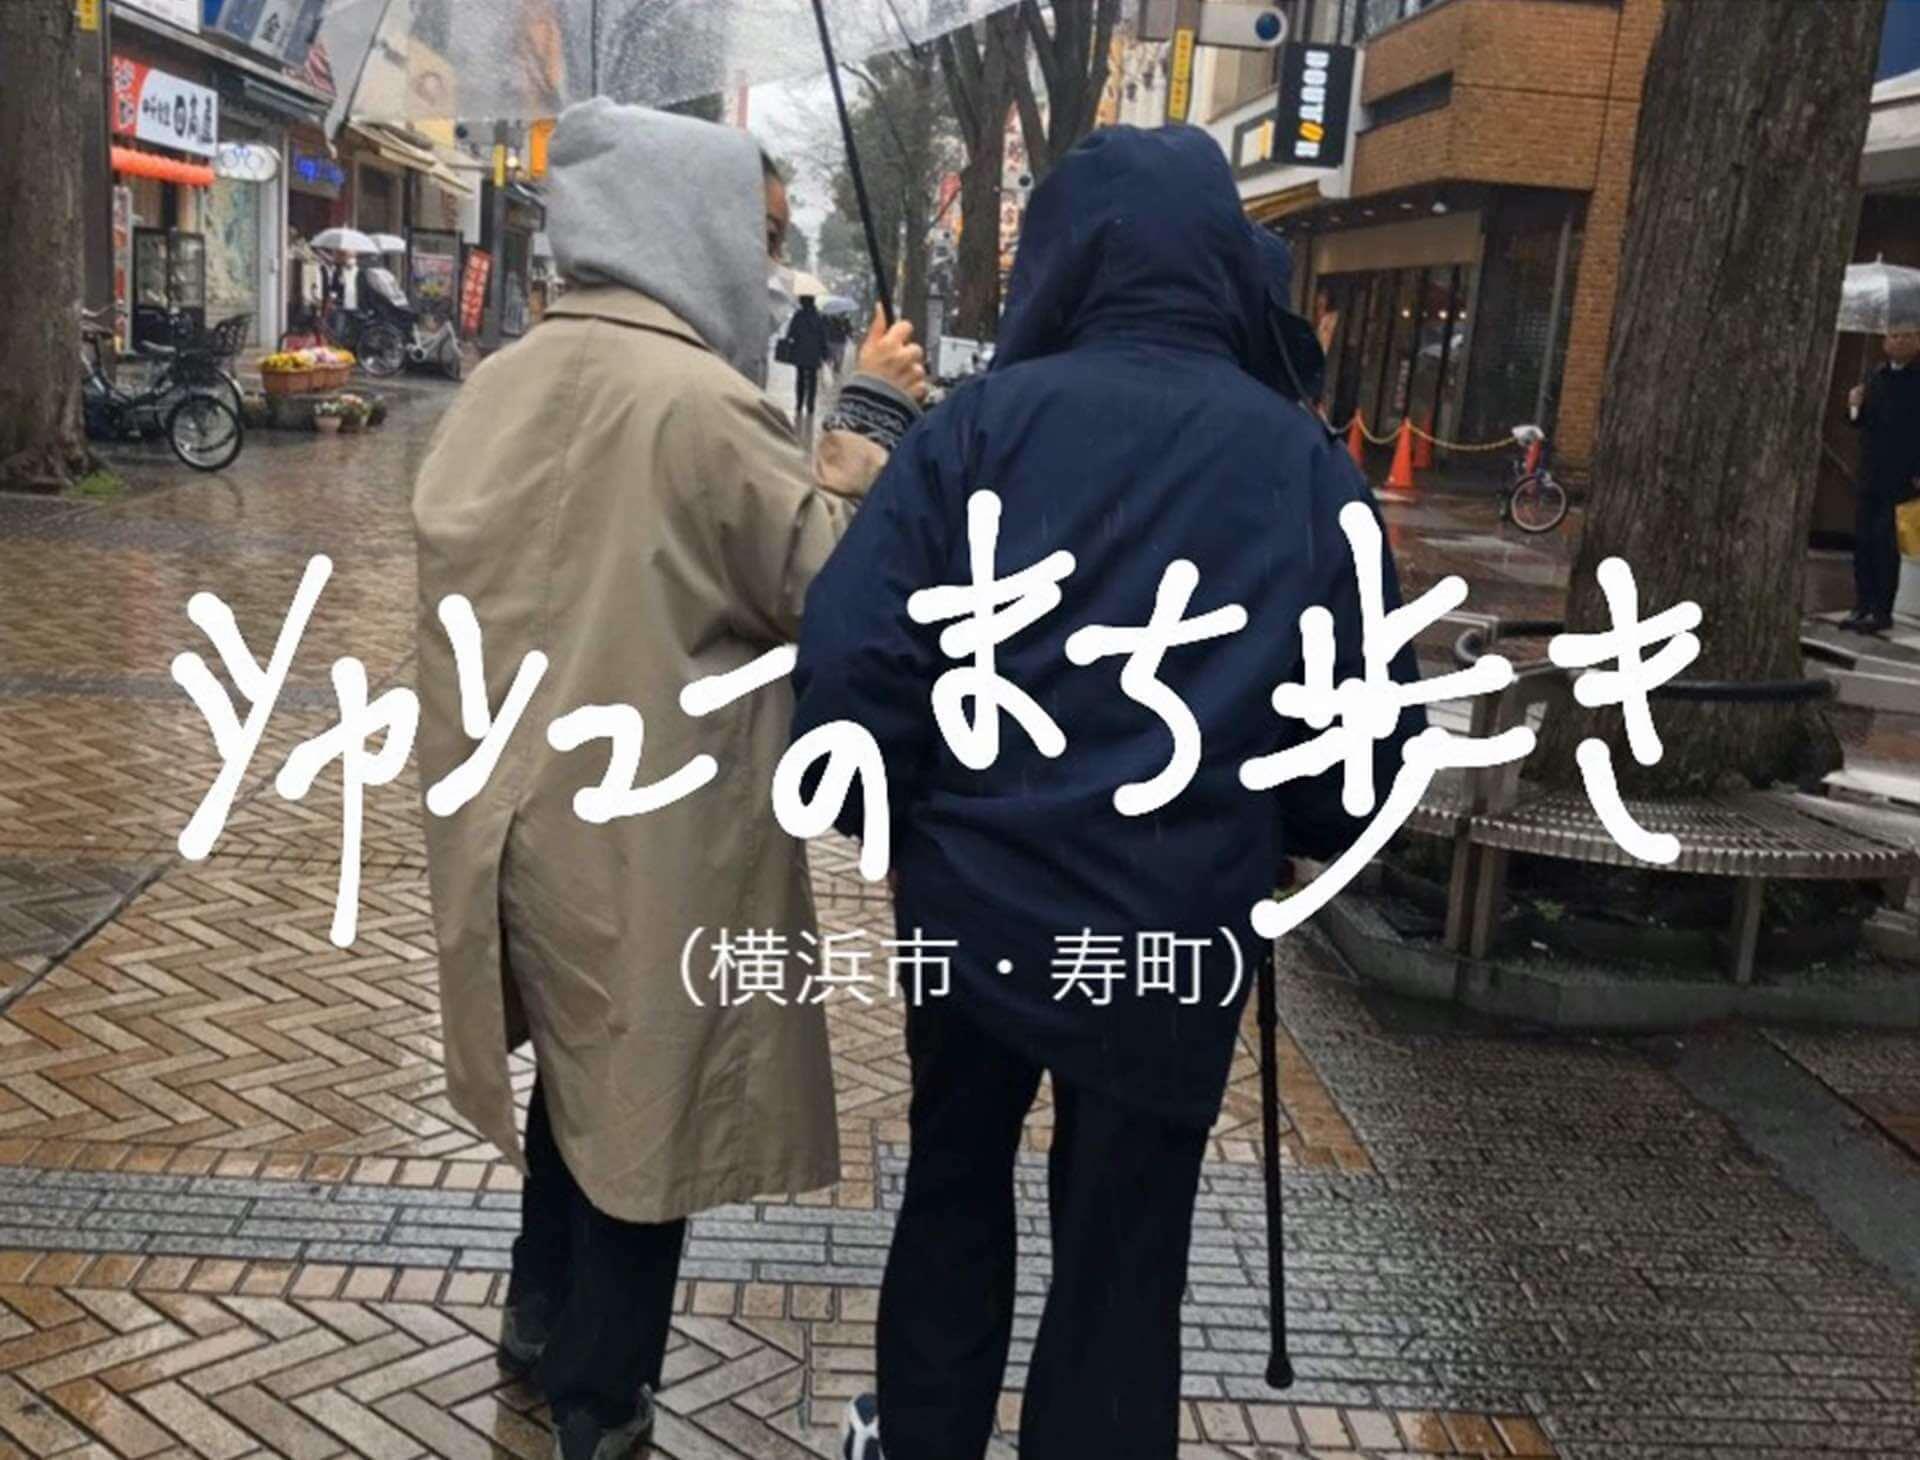 xiangyuの自主企画<香魚荘#02>にTaigen Kawabeのソロプロジェクト・Ill Japoniaが出演決定!公開ミーティングは今夜開催 music200819_xiangyu_4-1920x1460